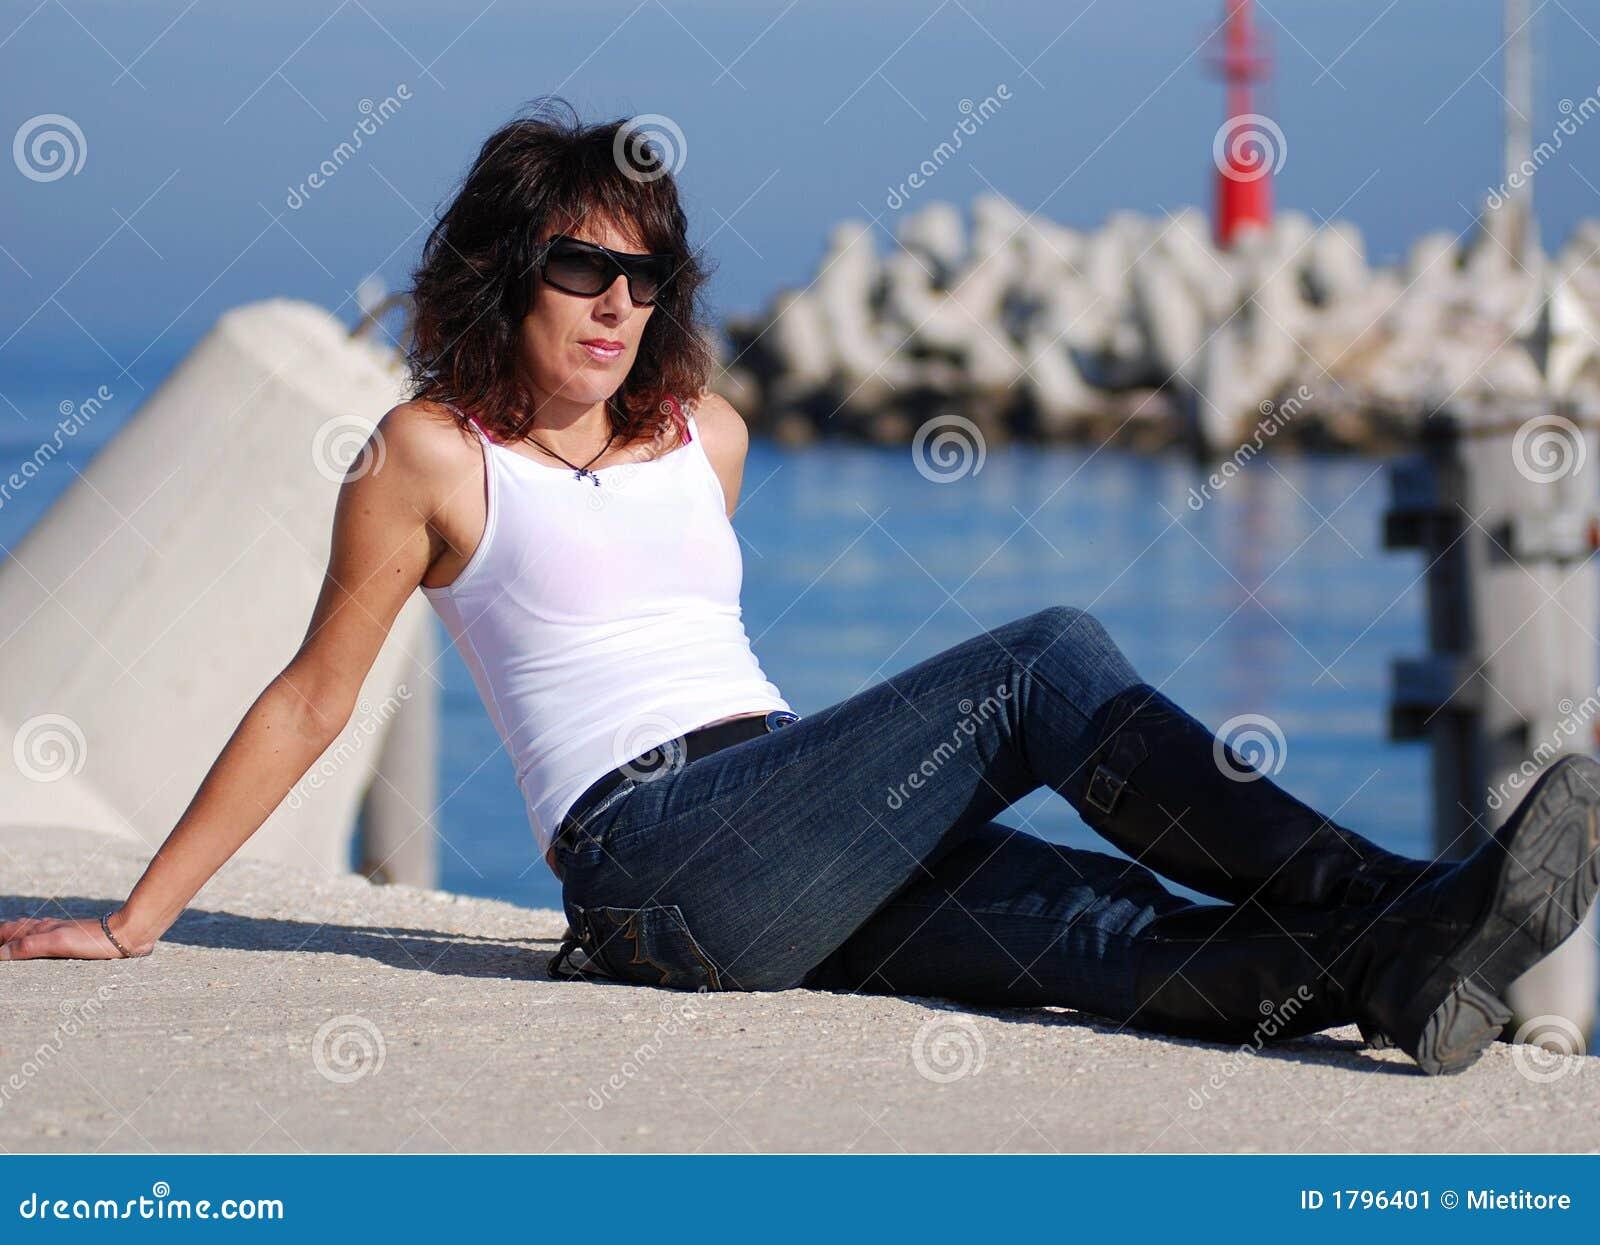 Italian Fashion Woman  Stock Image Image Of Mature - 1796401-6744